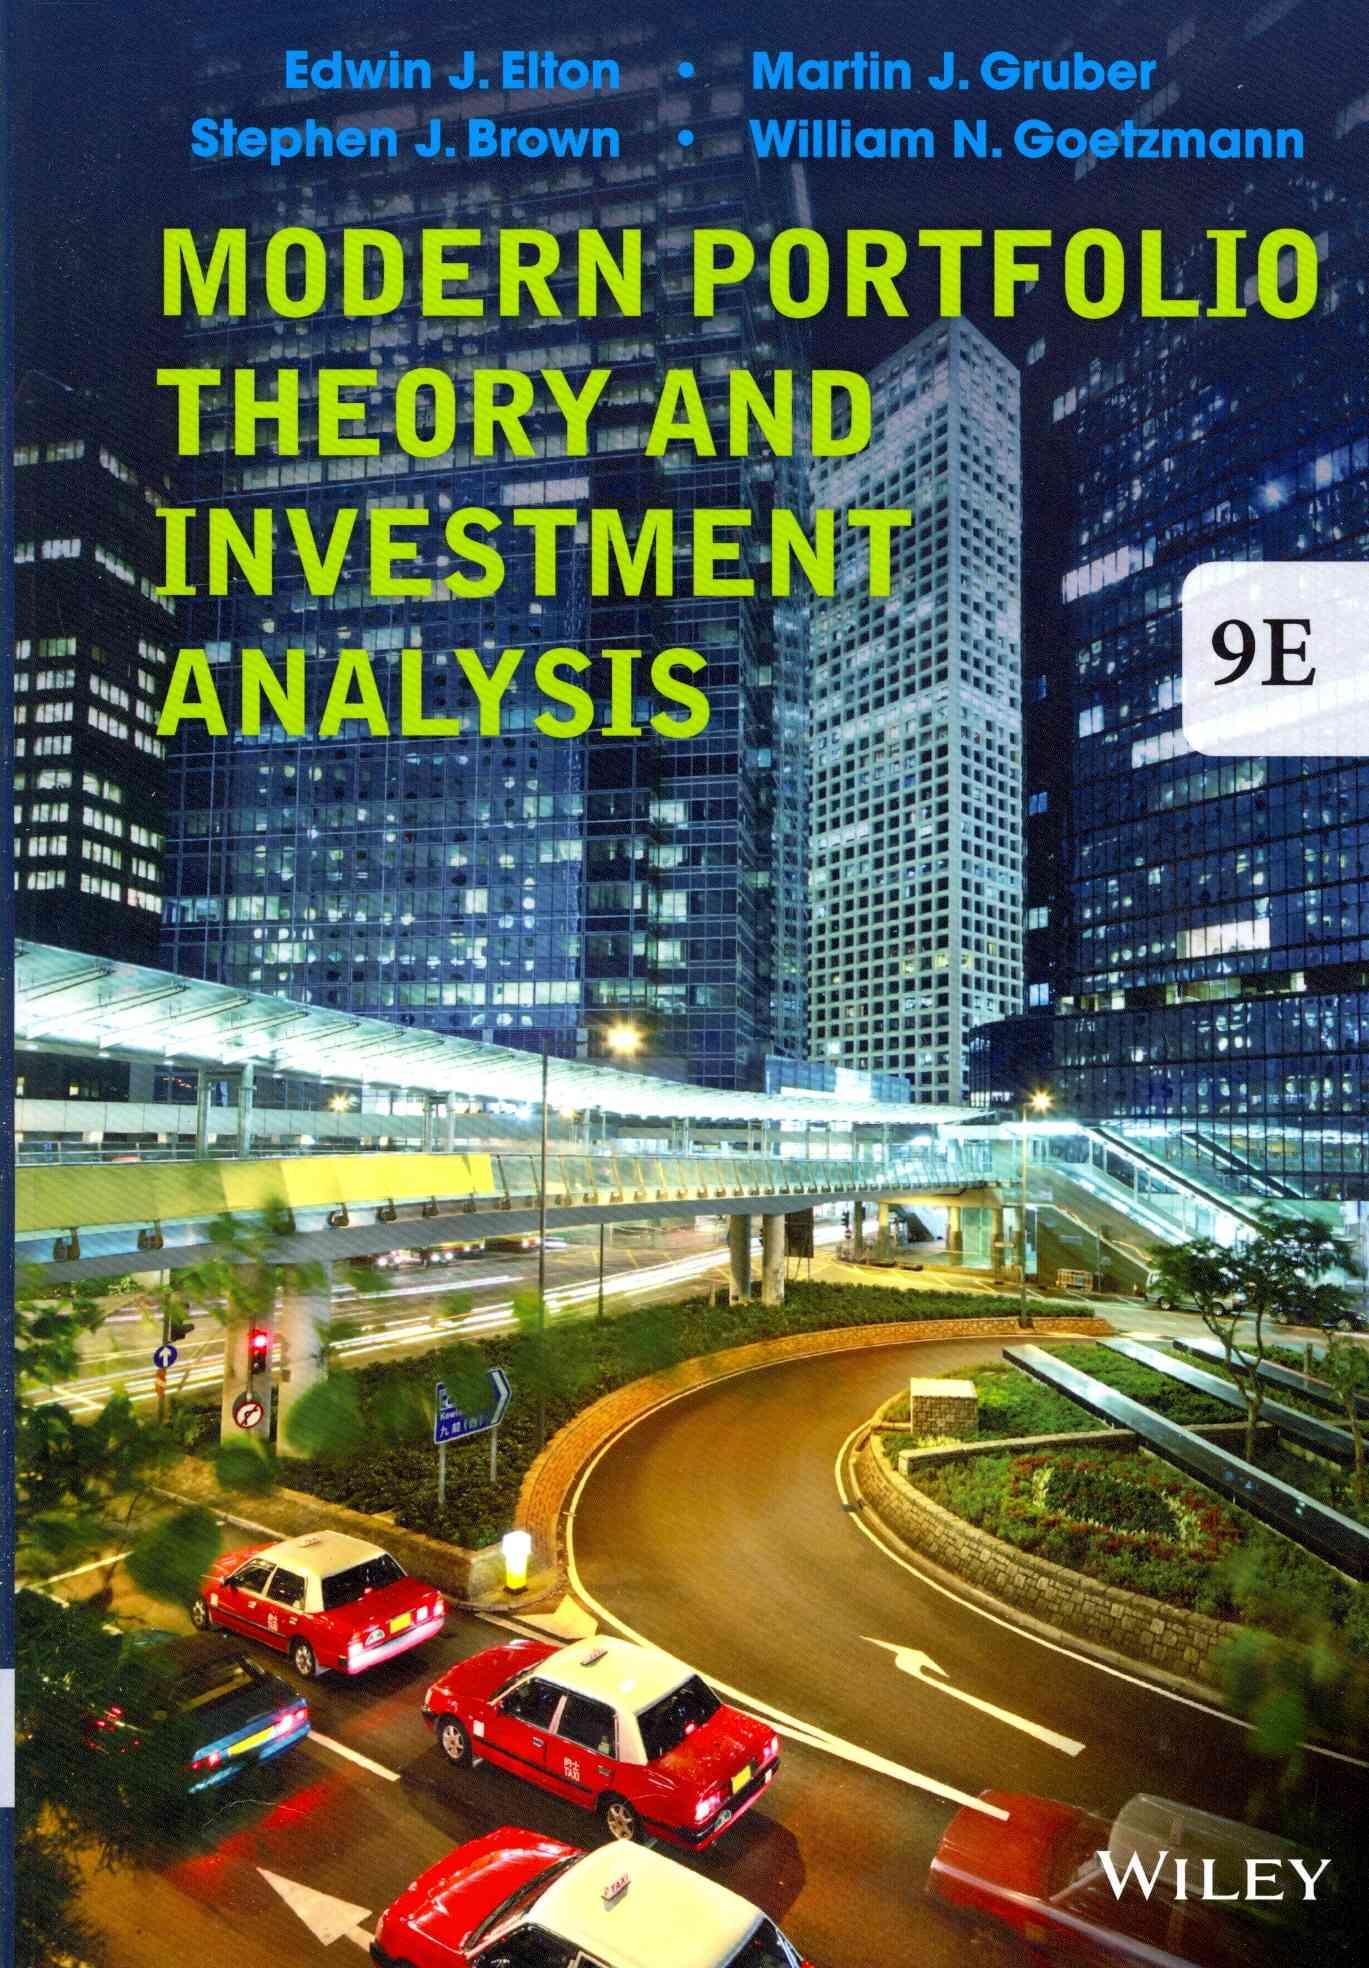 Modern Portfolio Theory and Investment Analysis By Elton, Edwin J.